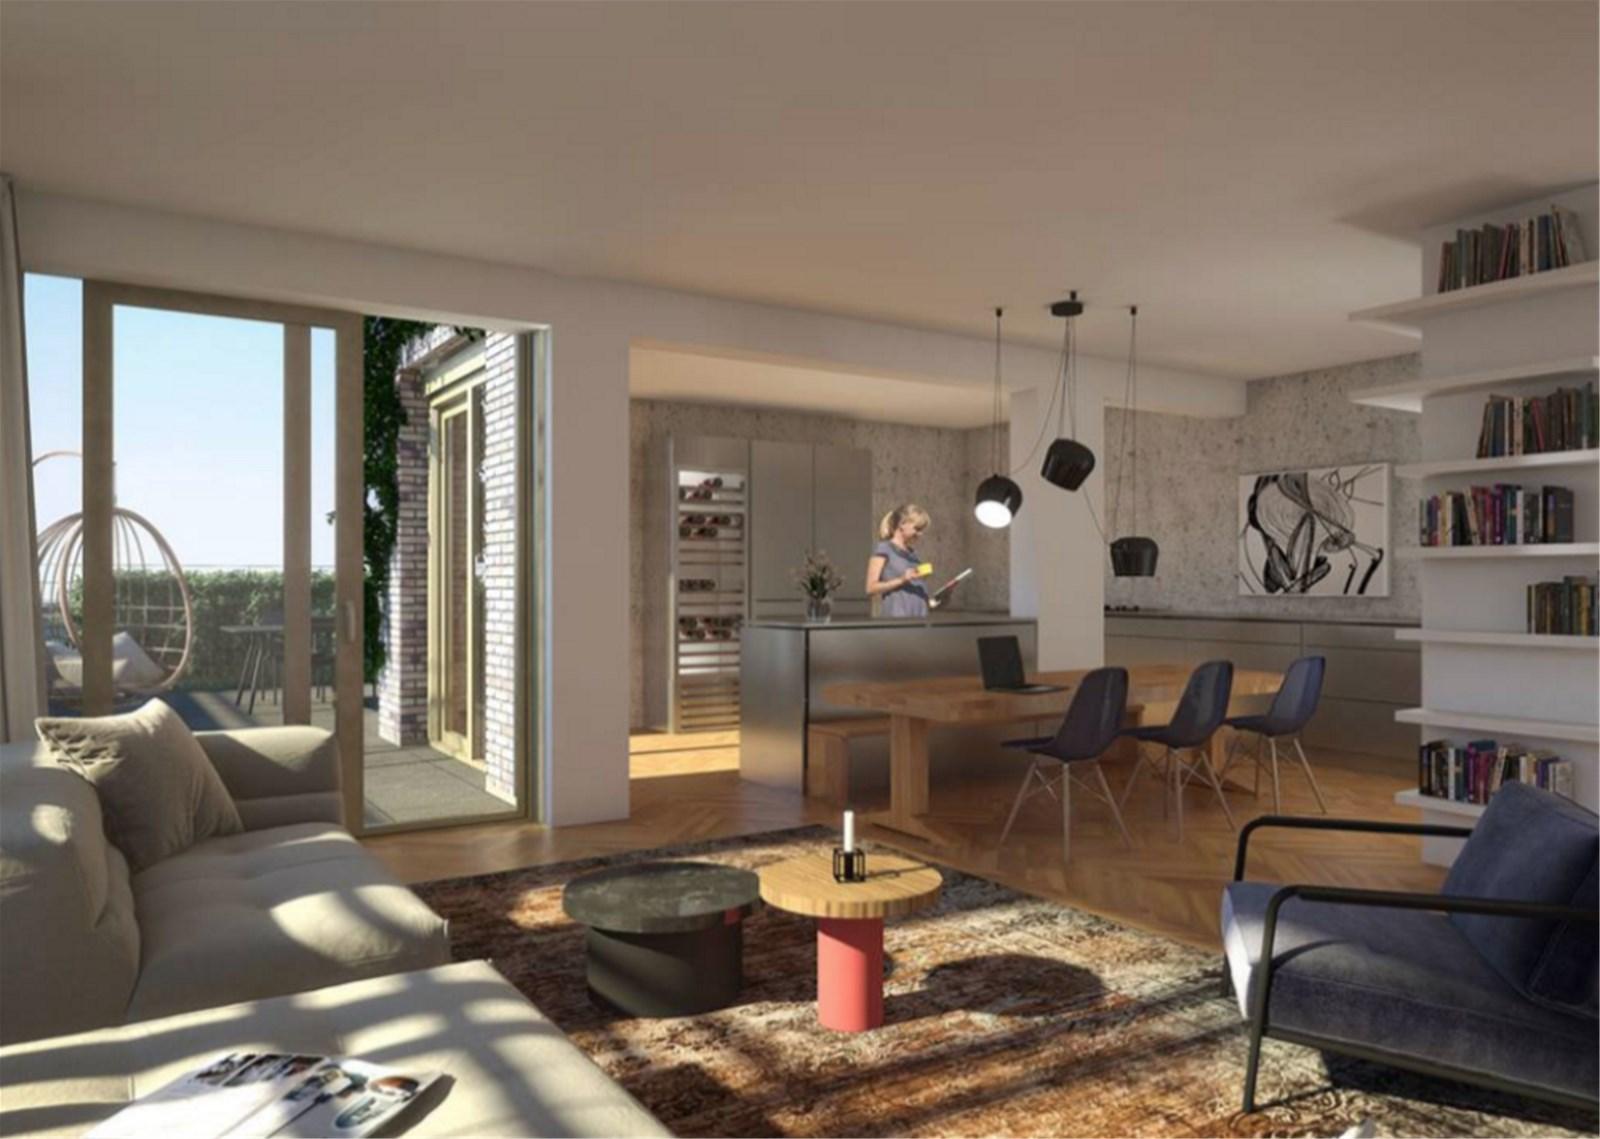 https://media.mva.nl/MVASysteem/WONEN/NBLNP297056/4-kamer-appartement.jpg